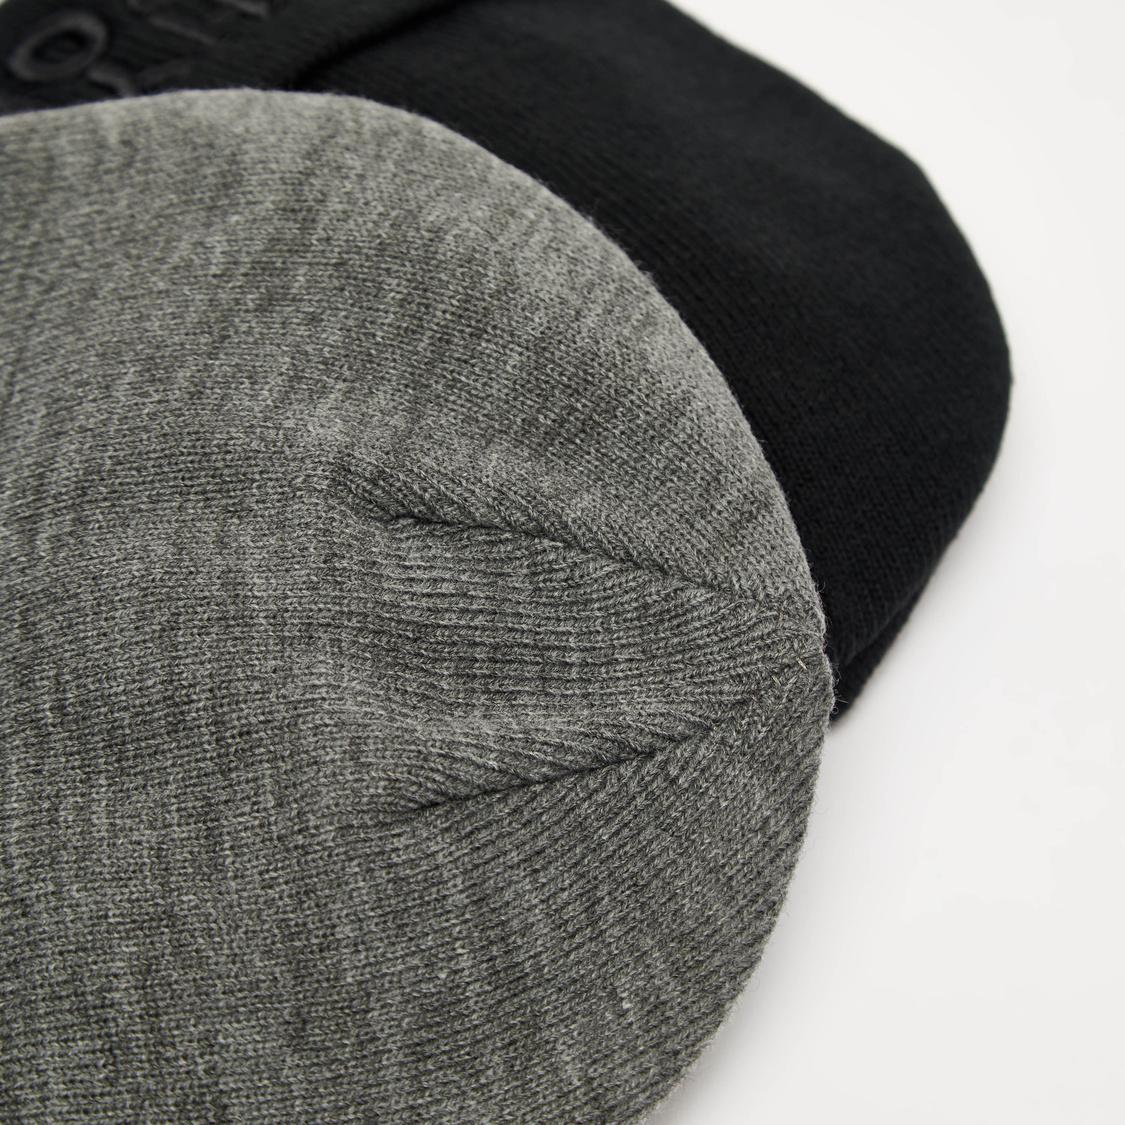 Set of 2 - Beanie Caps with Upturned Hem